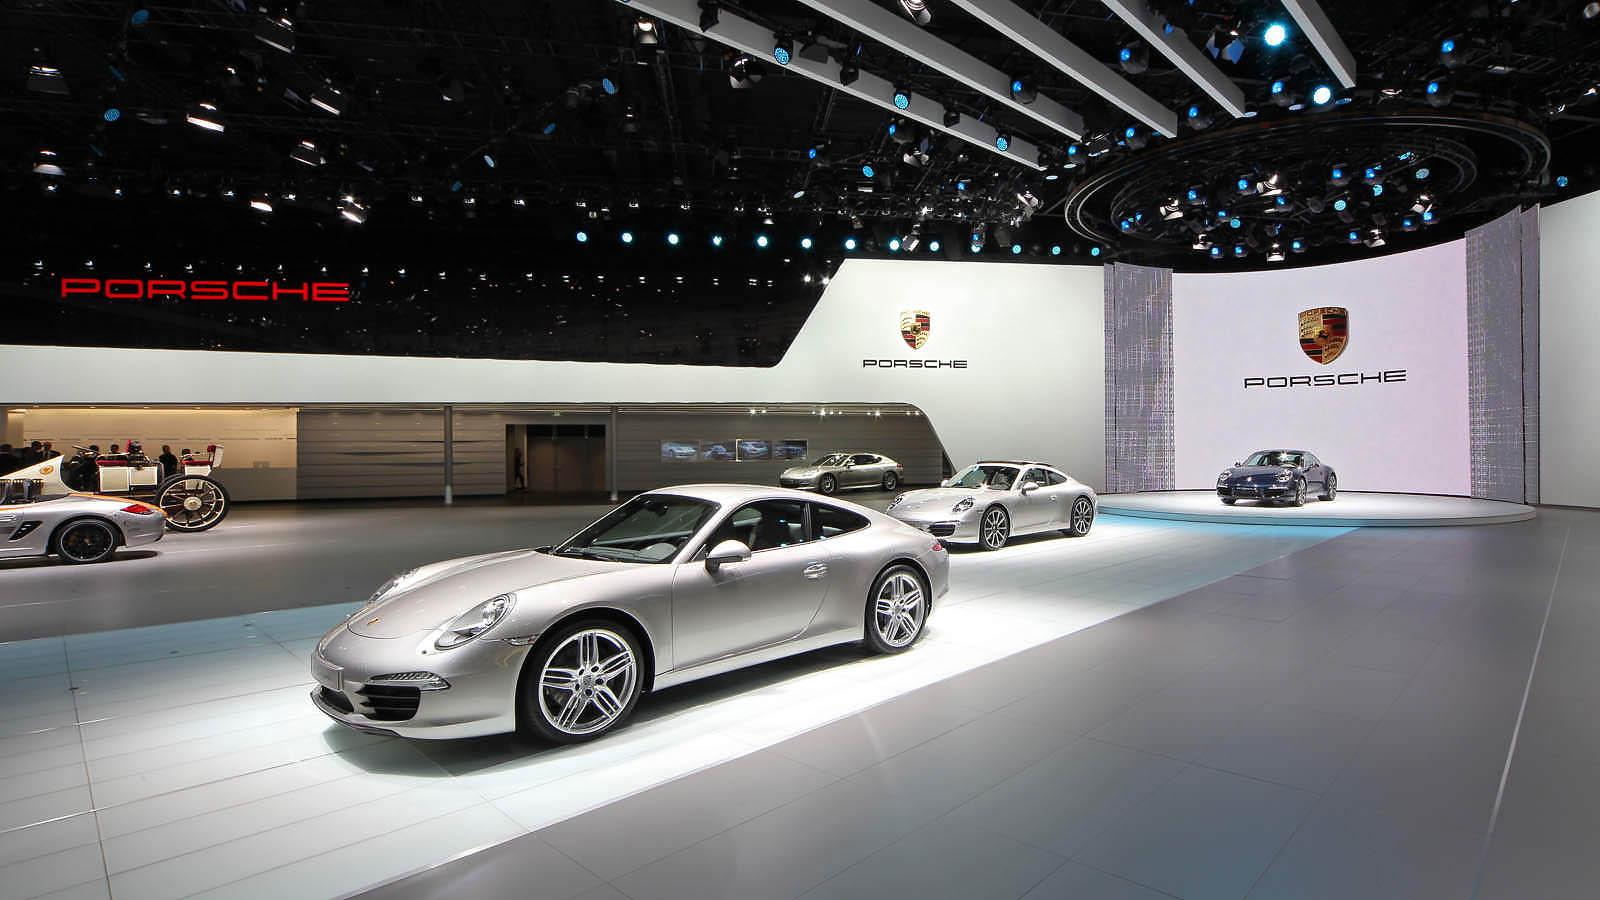 Porsche_IAA_2012.jpg